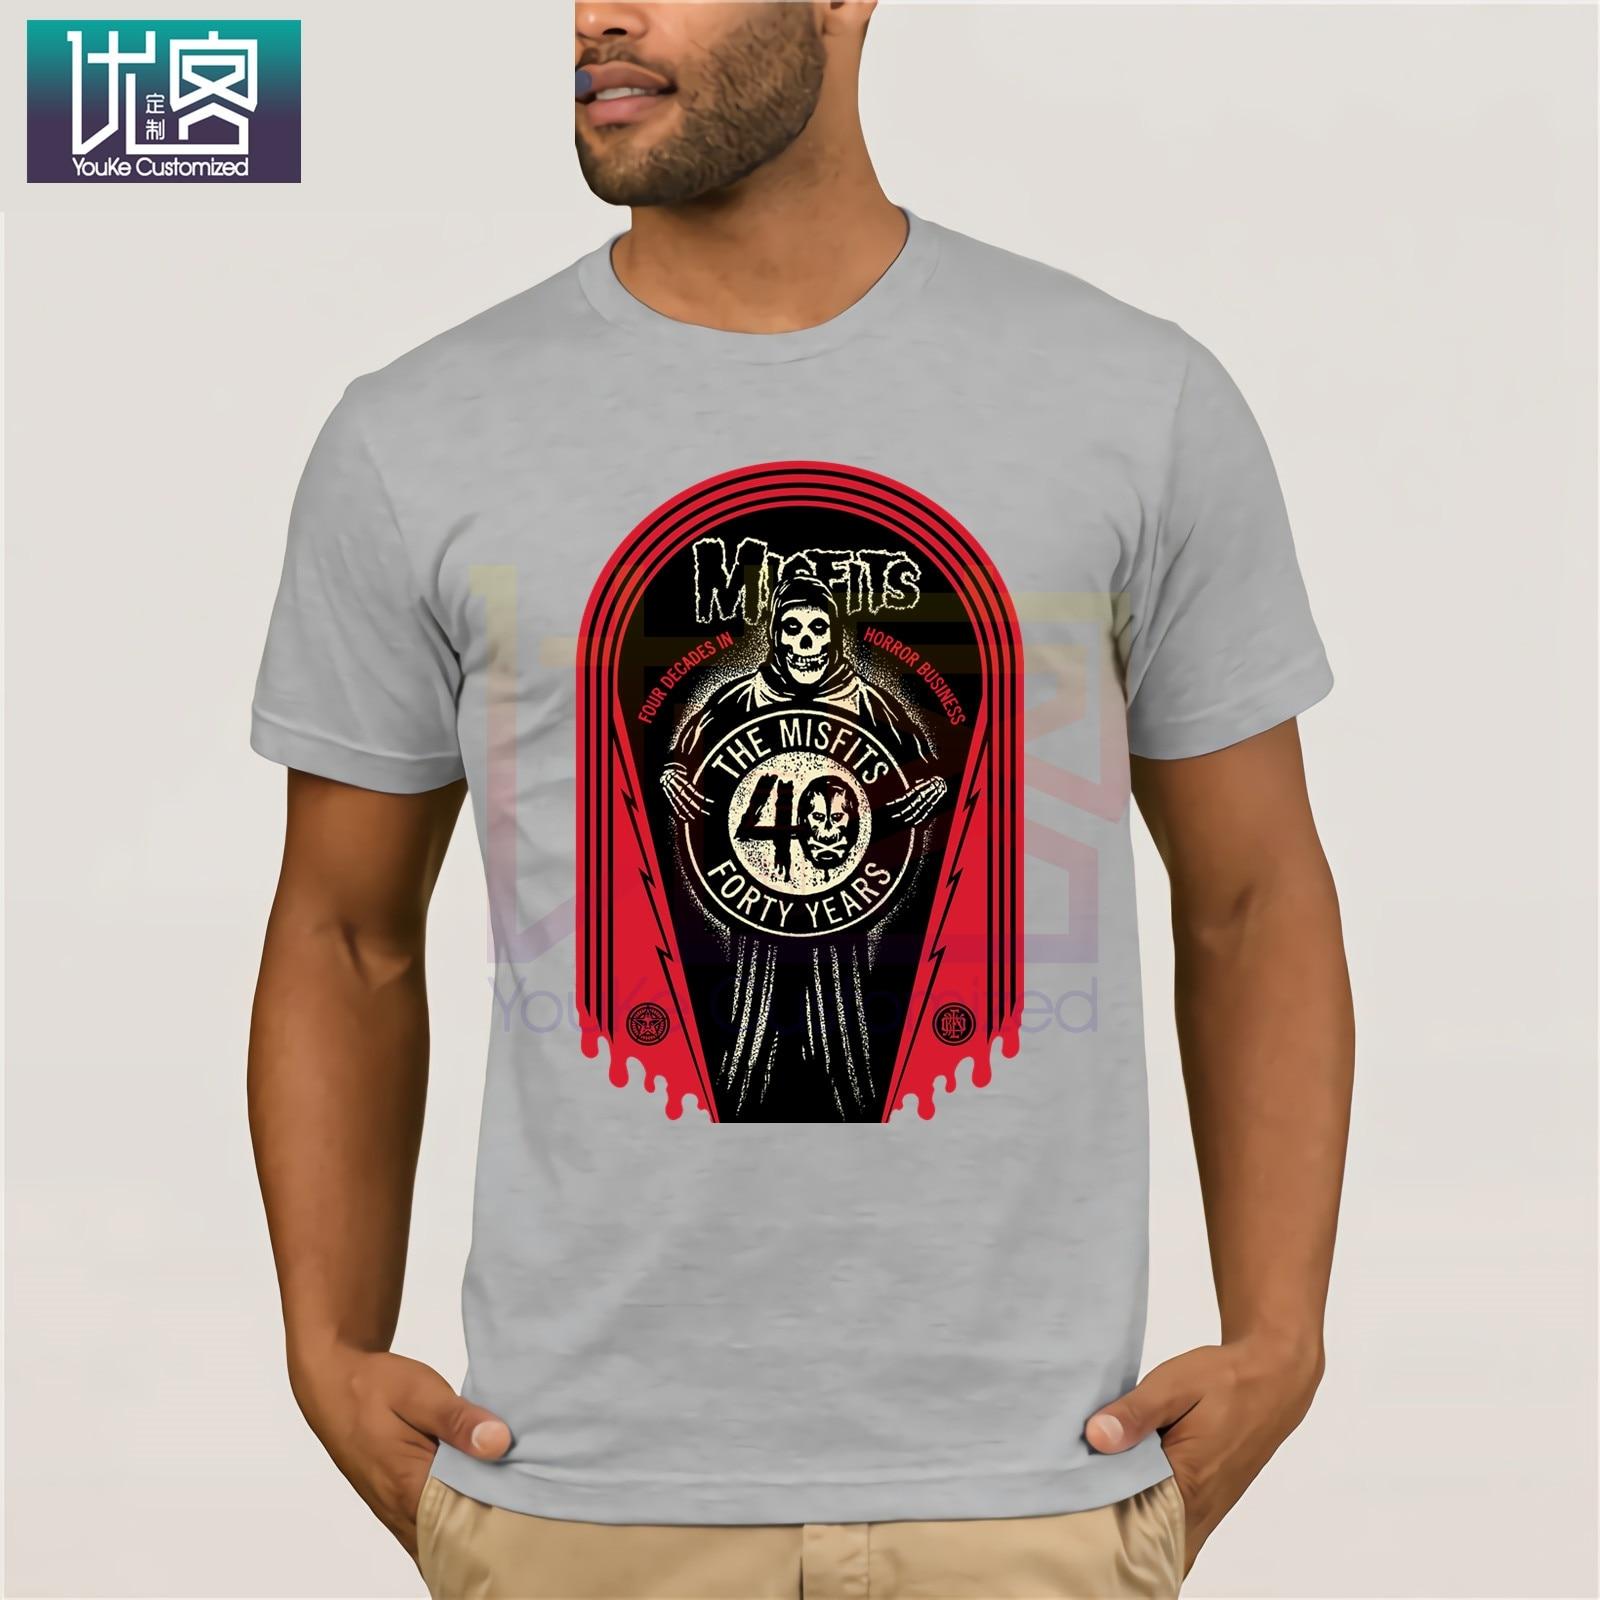 FUNNY MUSIC Mens Short Sleeve Cotton T-Shirts Misfits-40th-Anniversary-Logo Shirt